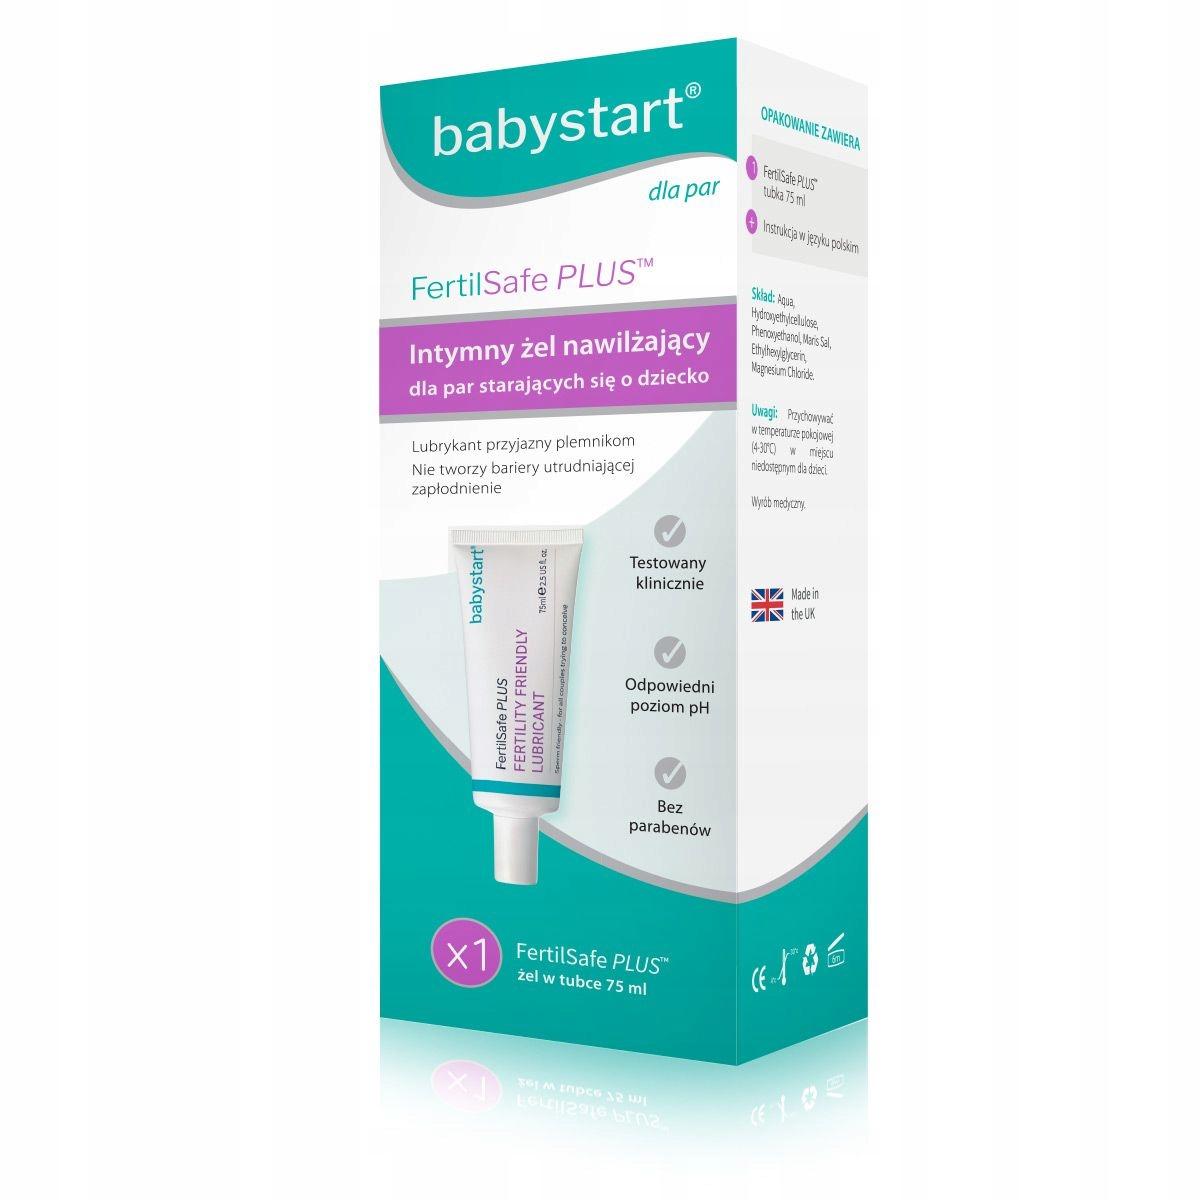 Item FertilSafe PLUS intimate gel 75ml get easy conceive